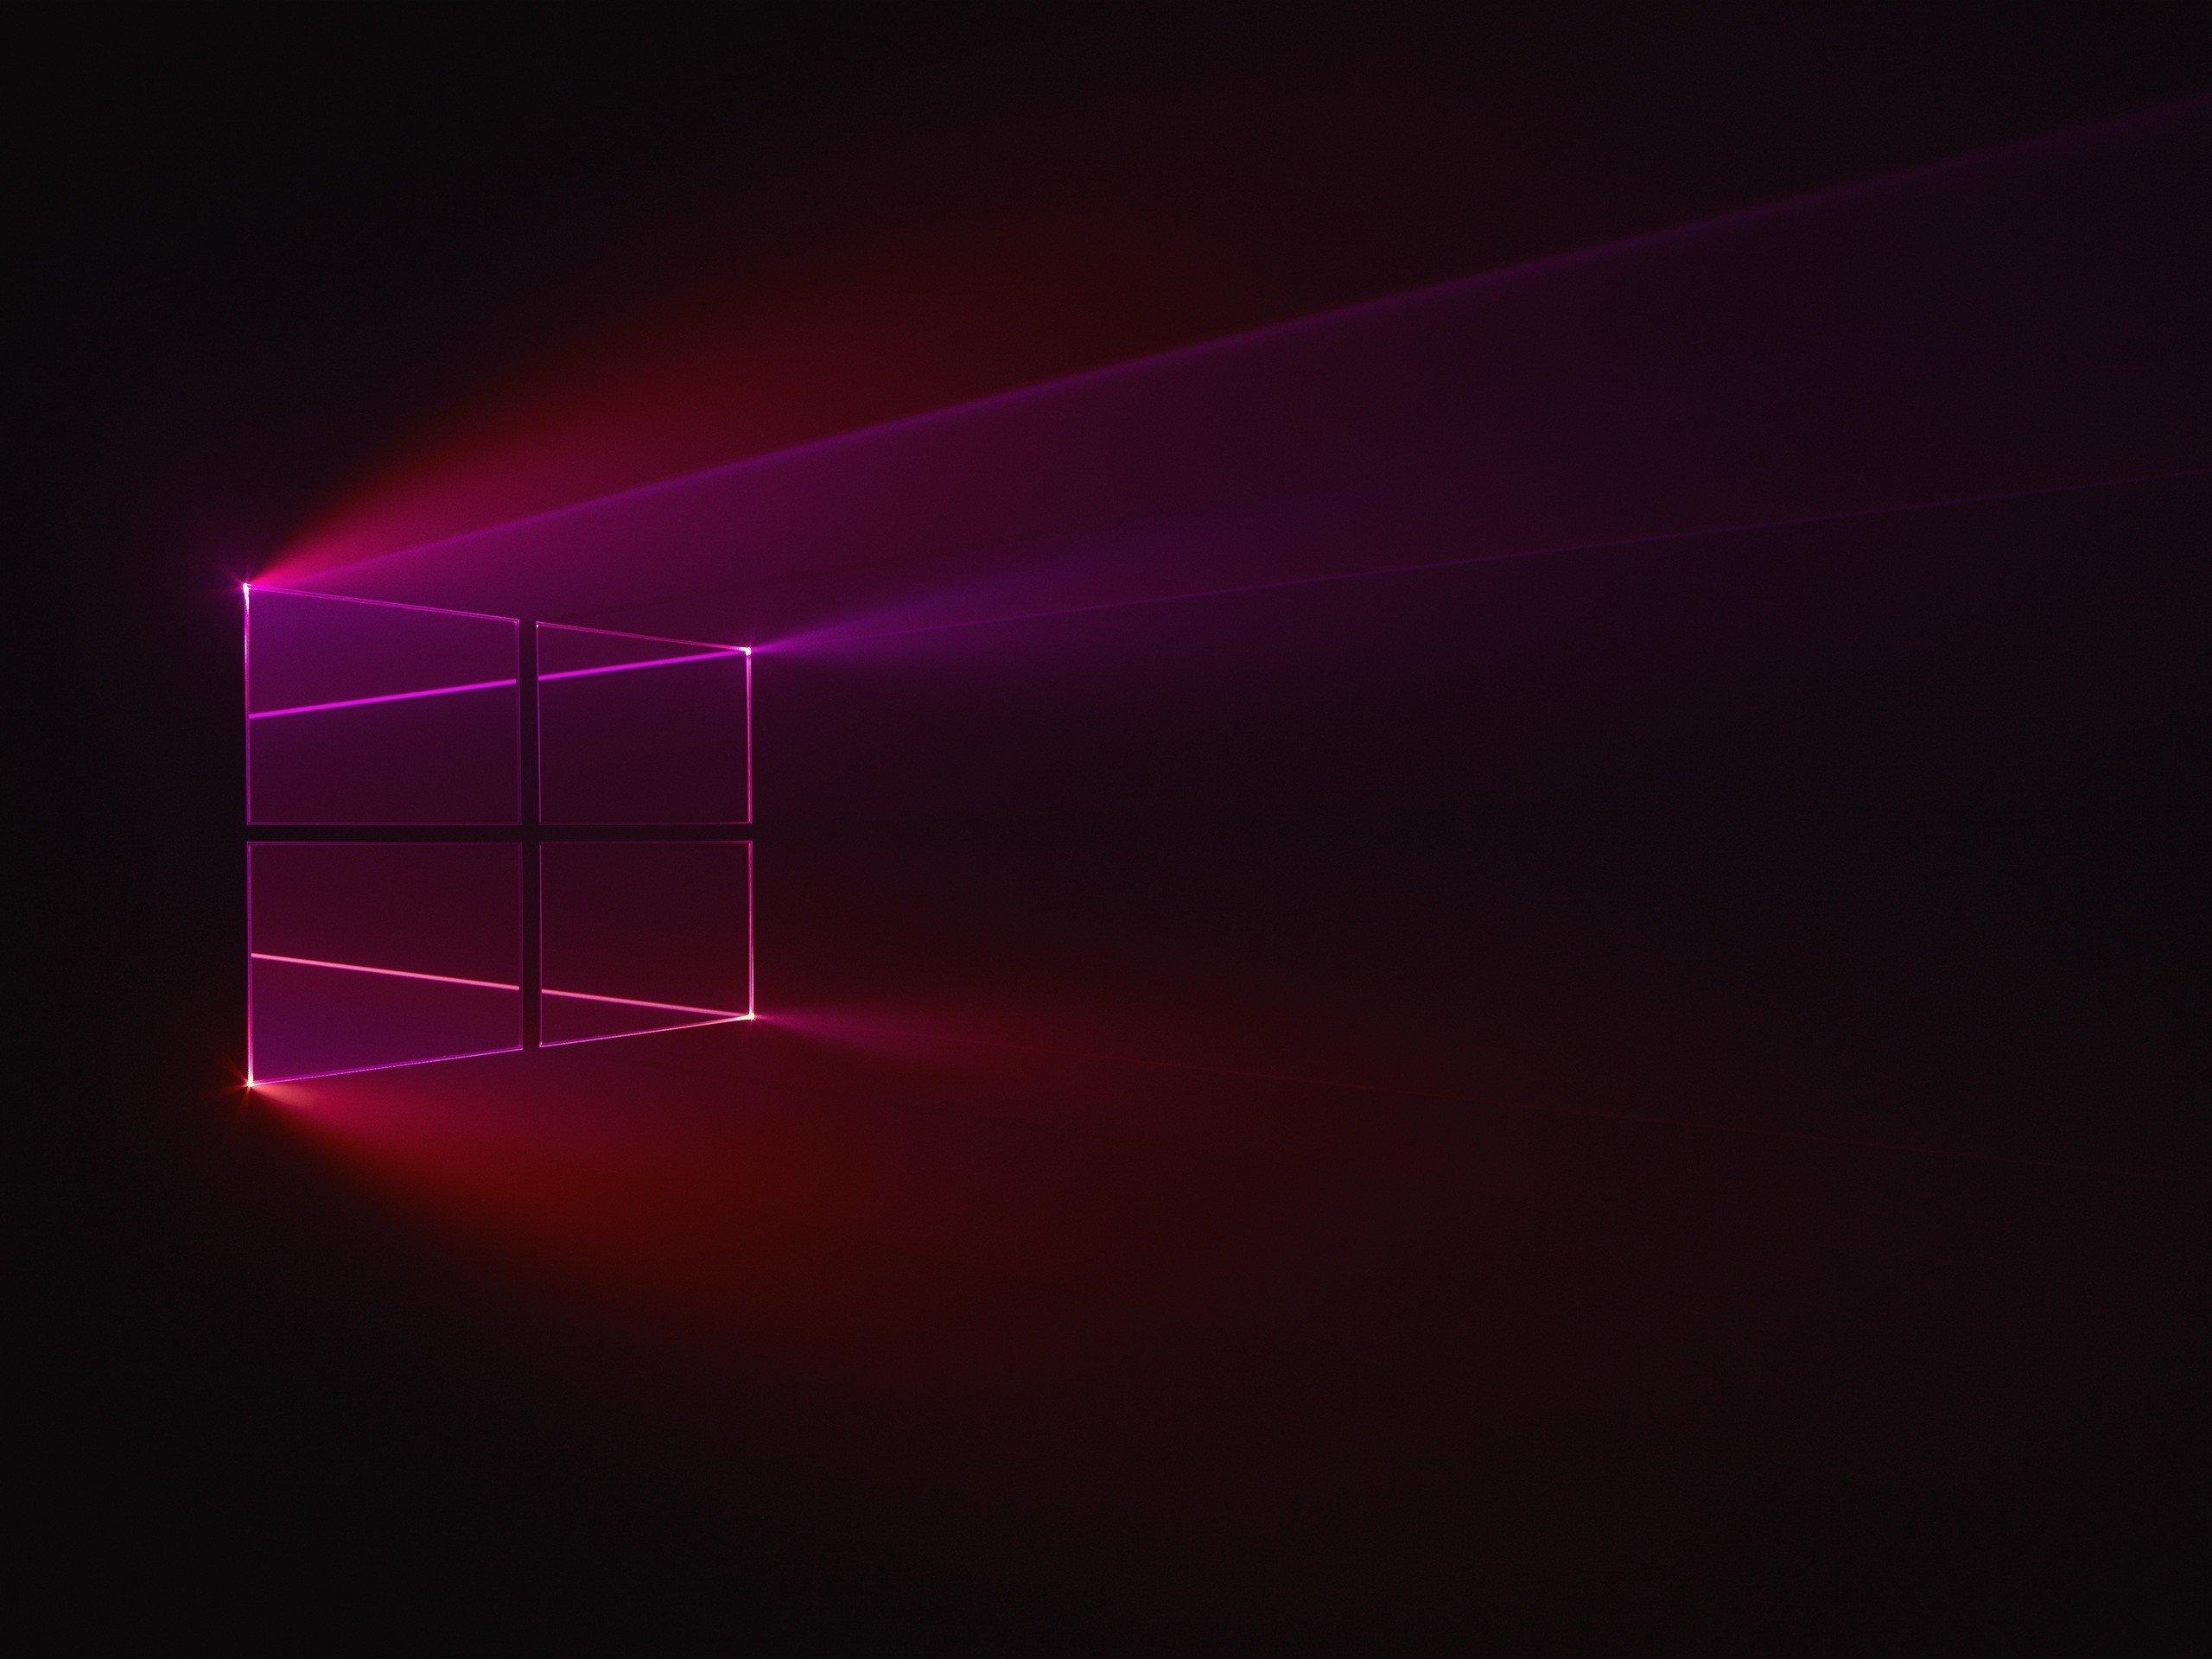 Windows 10 red wallpaper